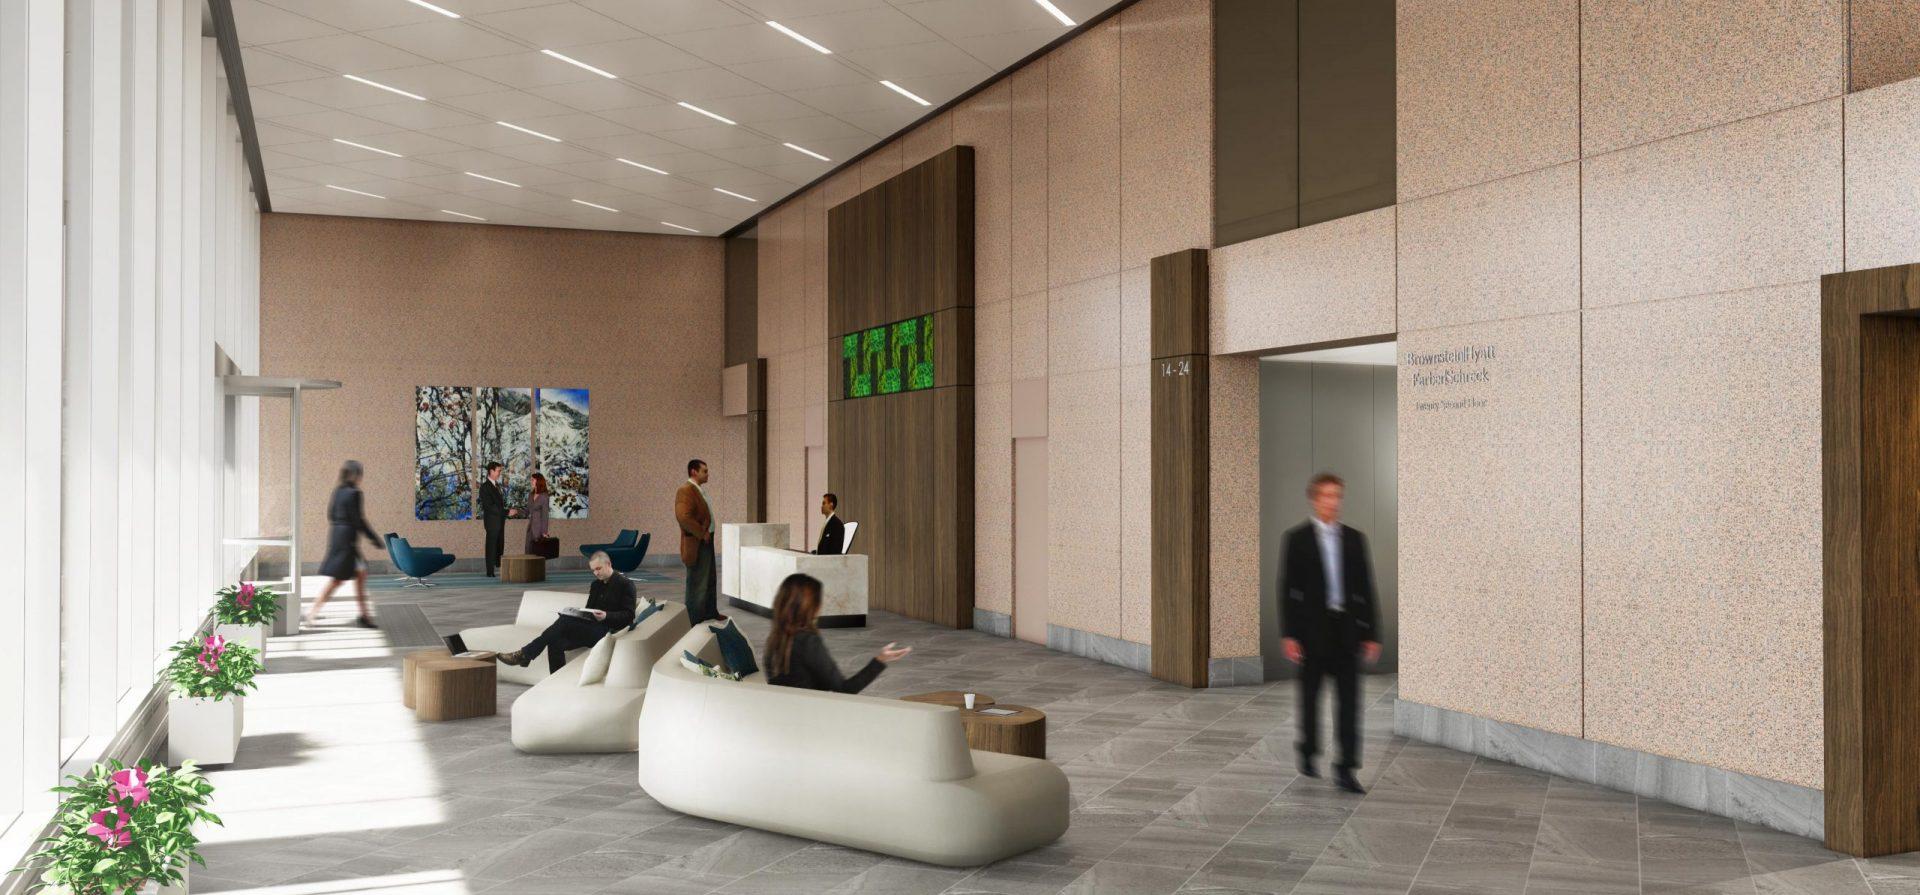 410 17th St Lobby & Amenity Center